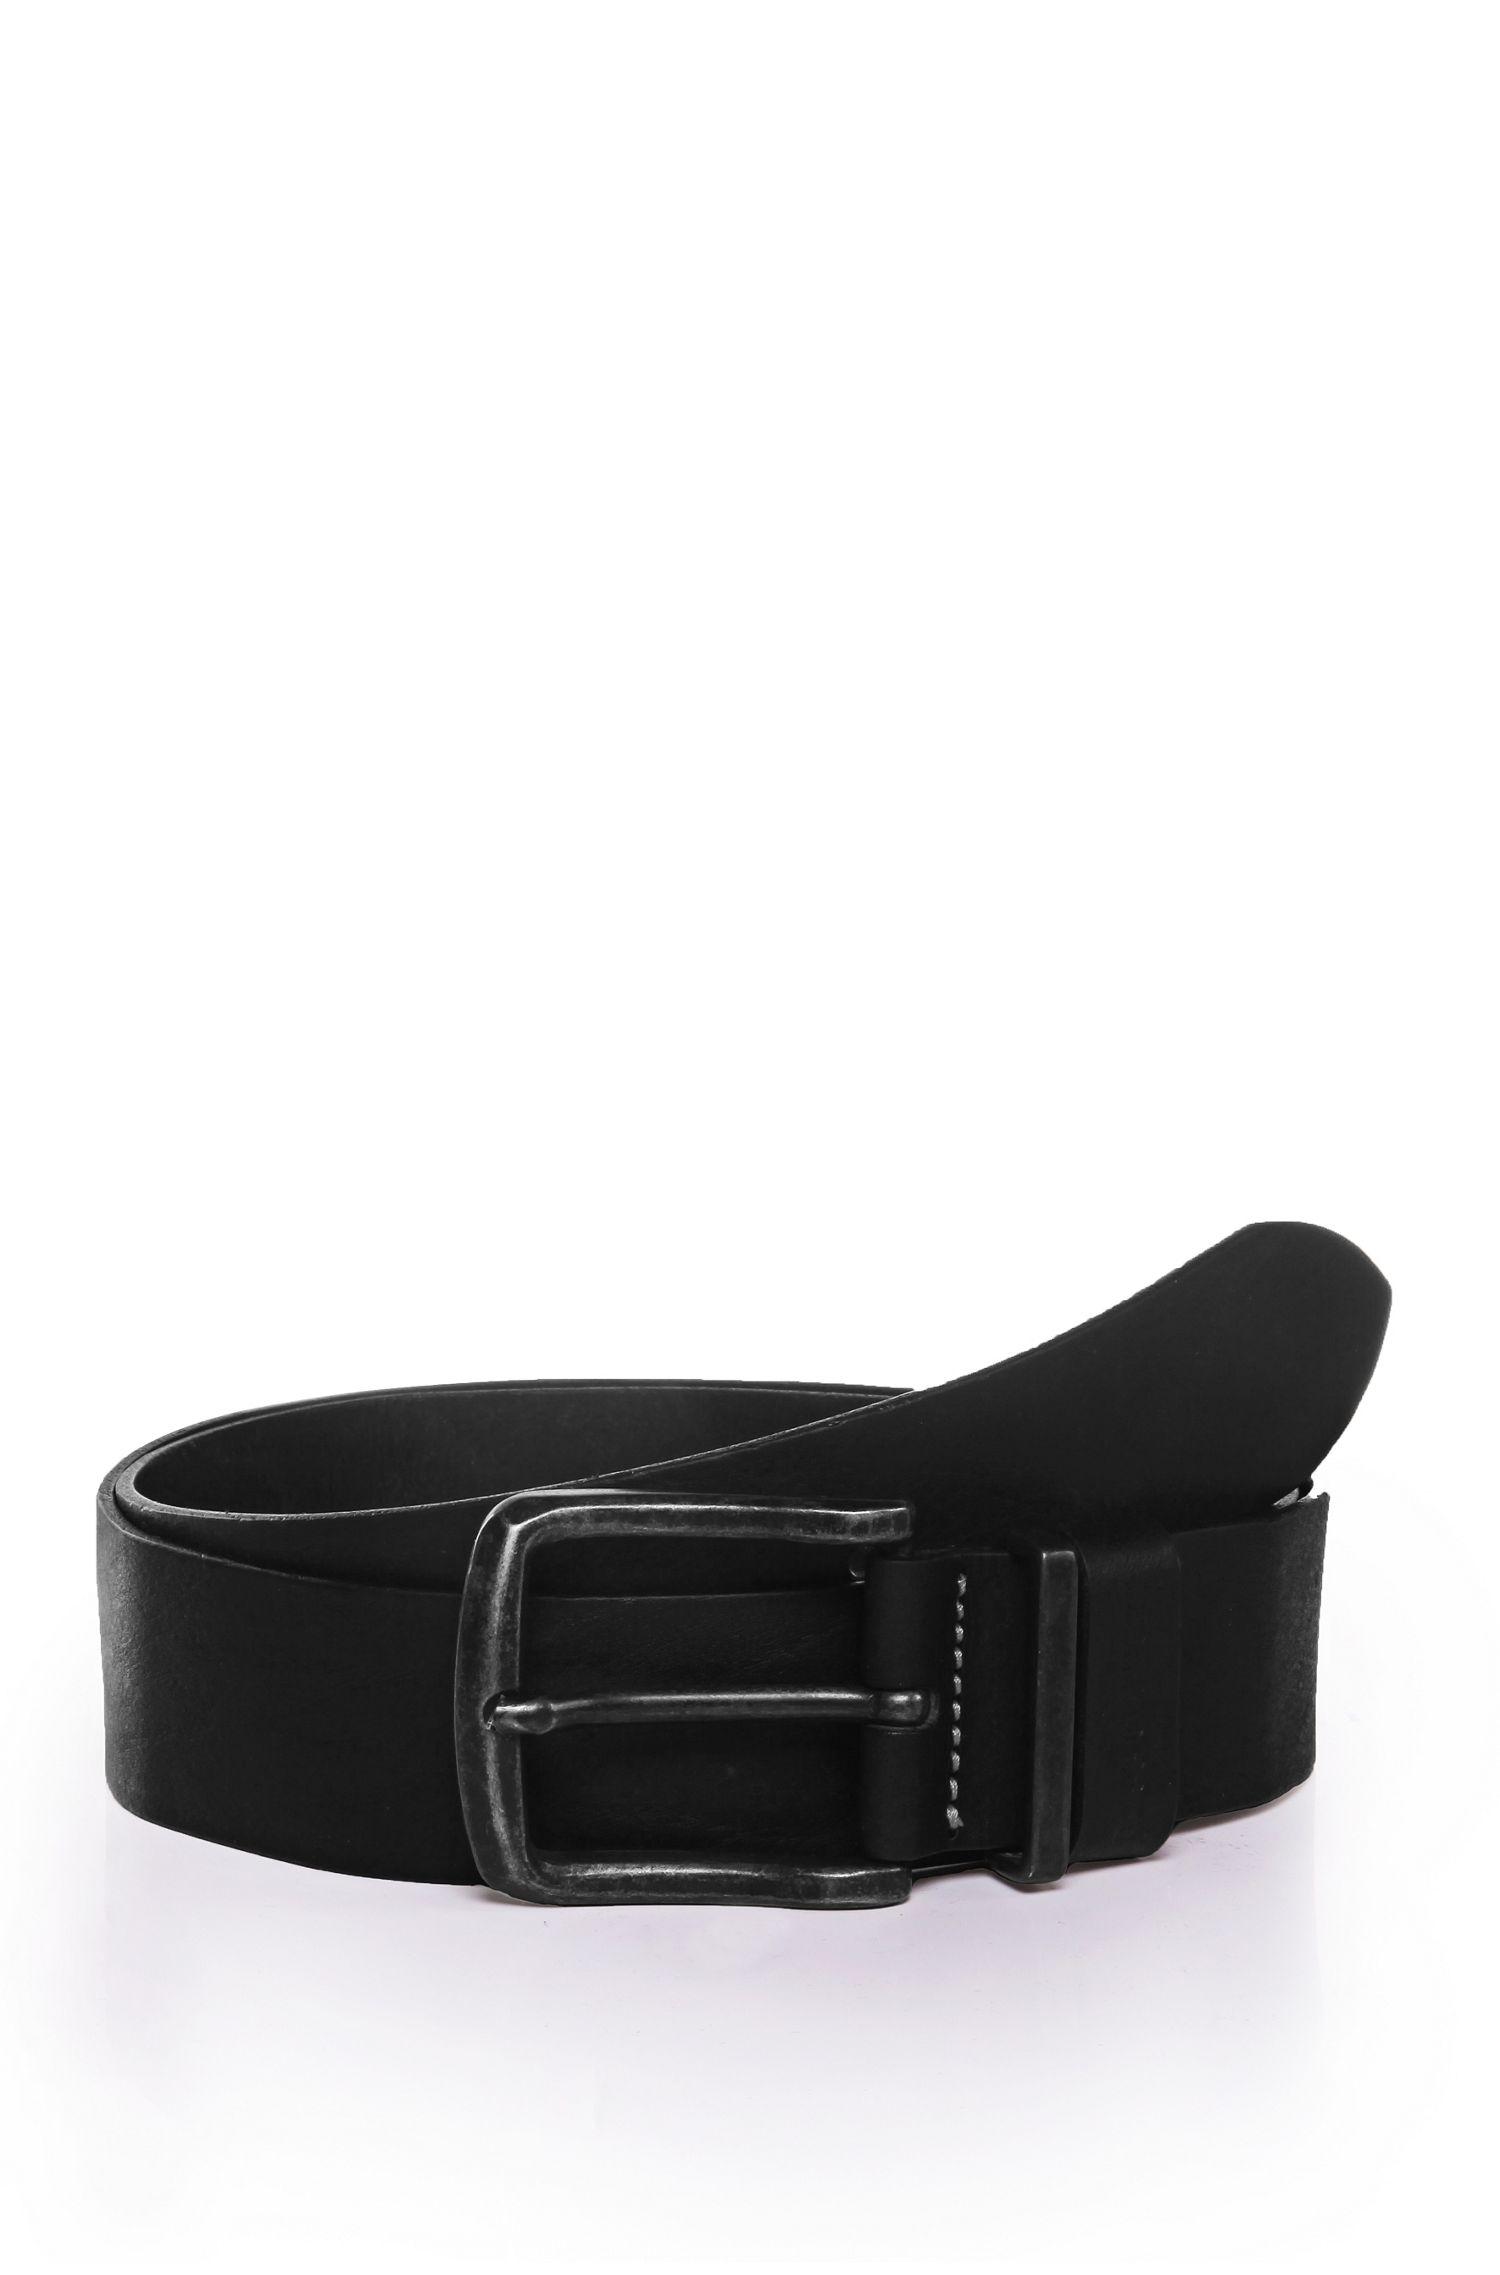 'Jeppo' | Italian Leather Belt